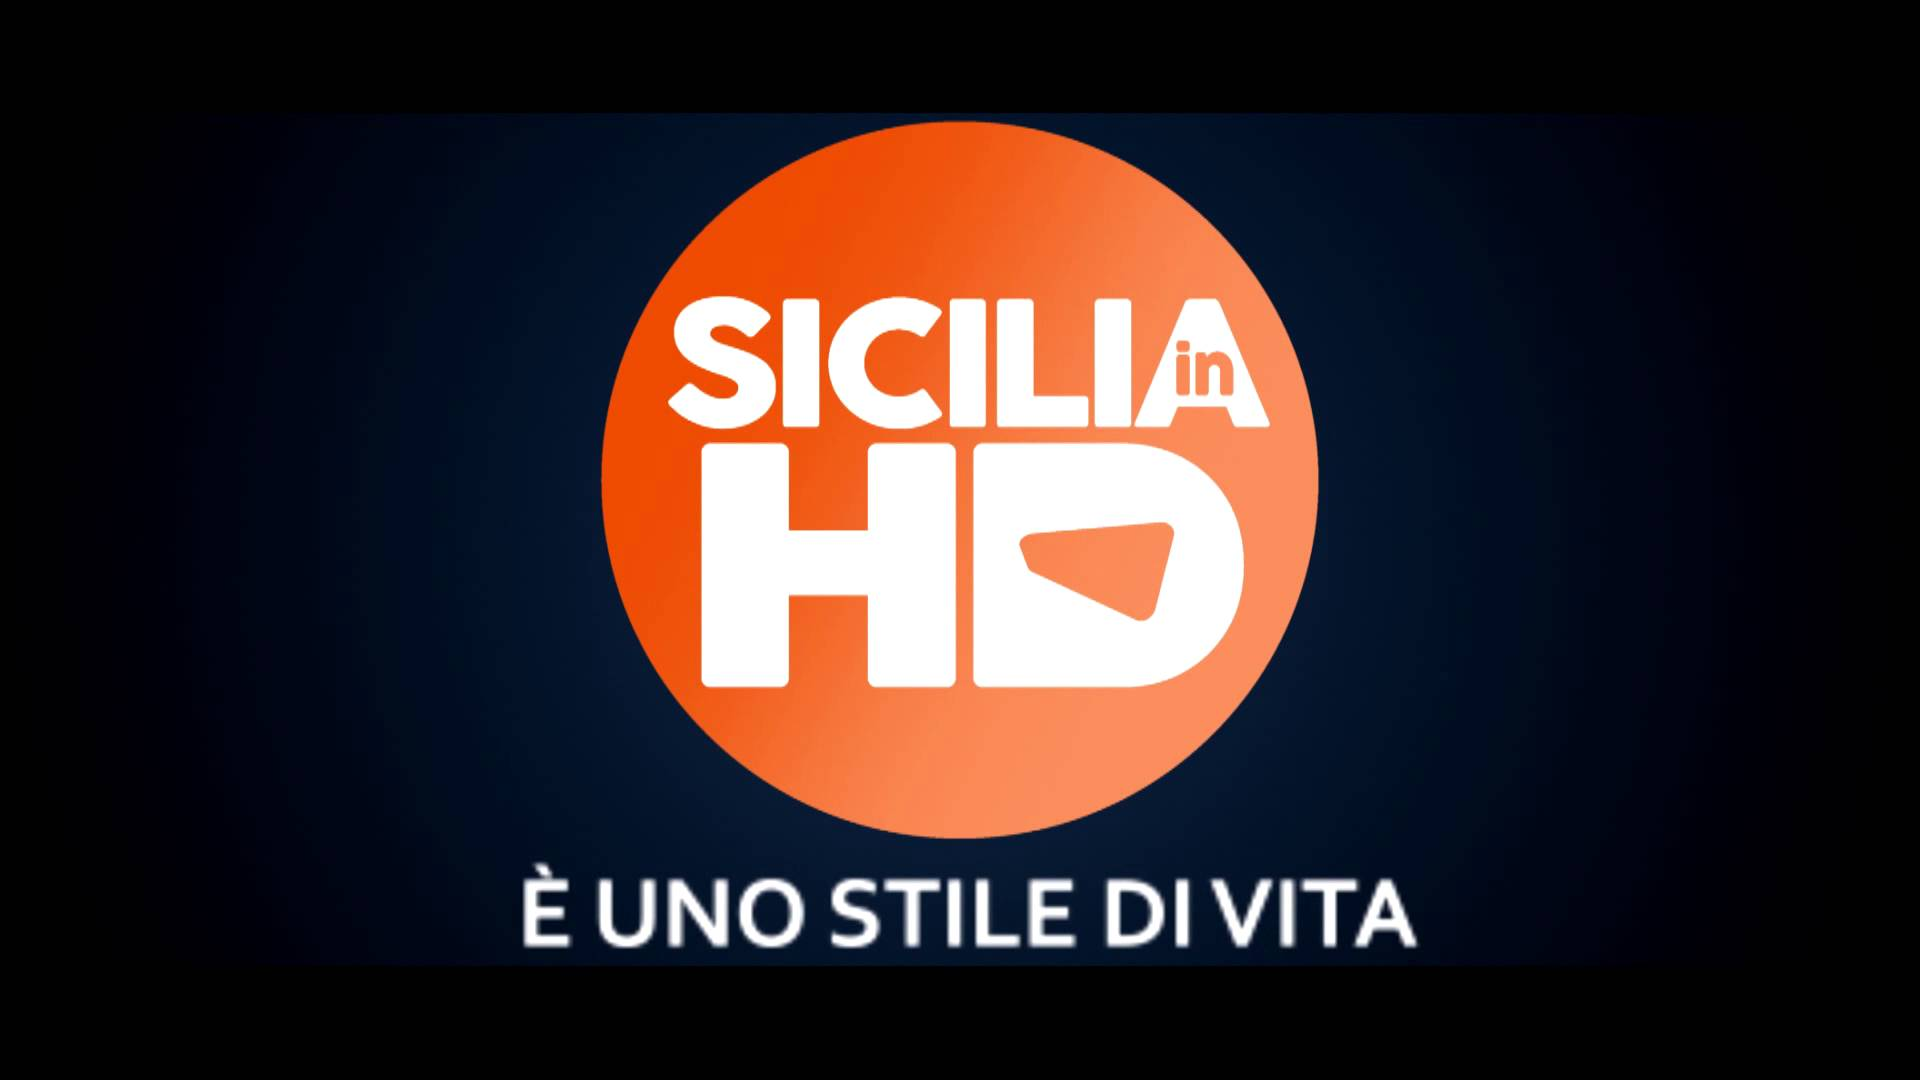 普罗菲洛 Sicilia HD 卡纳勒电视